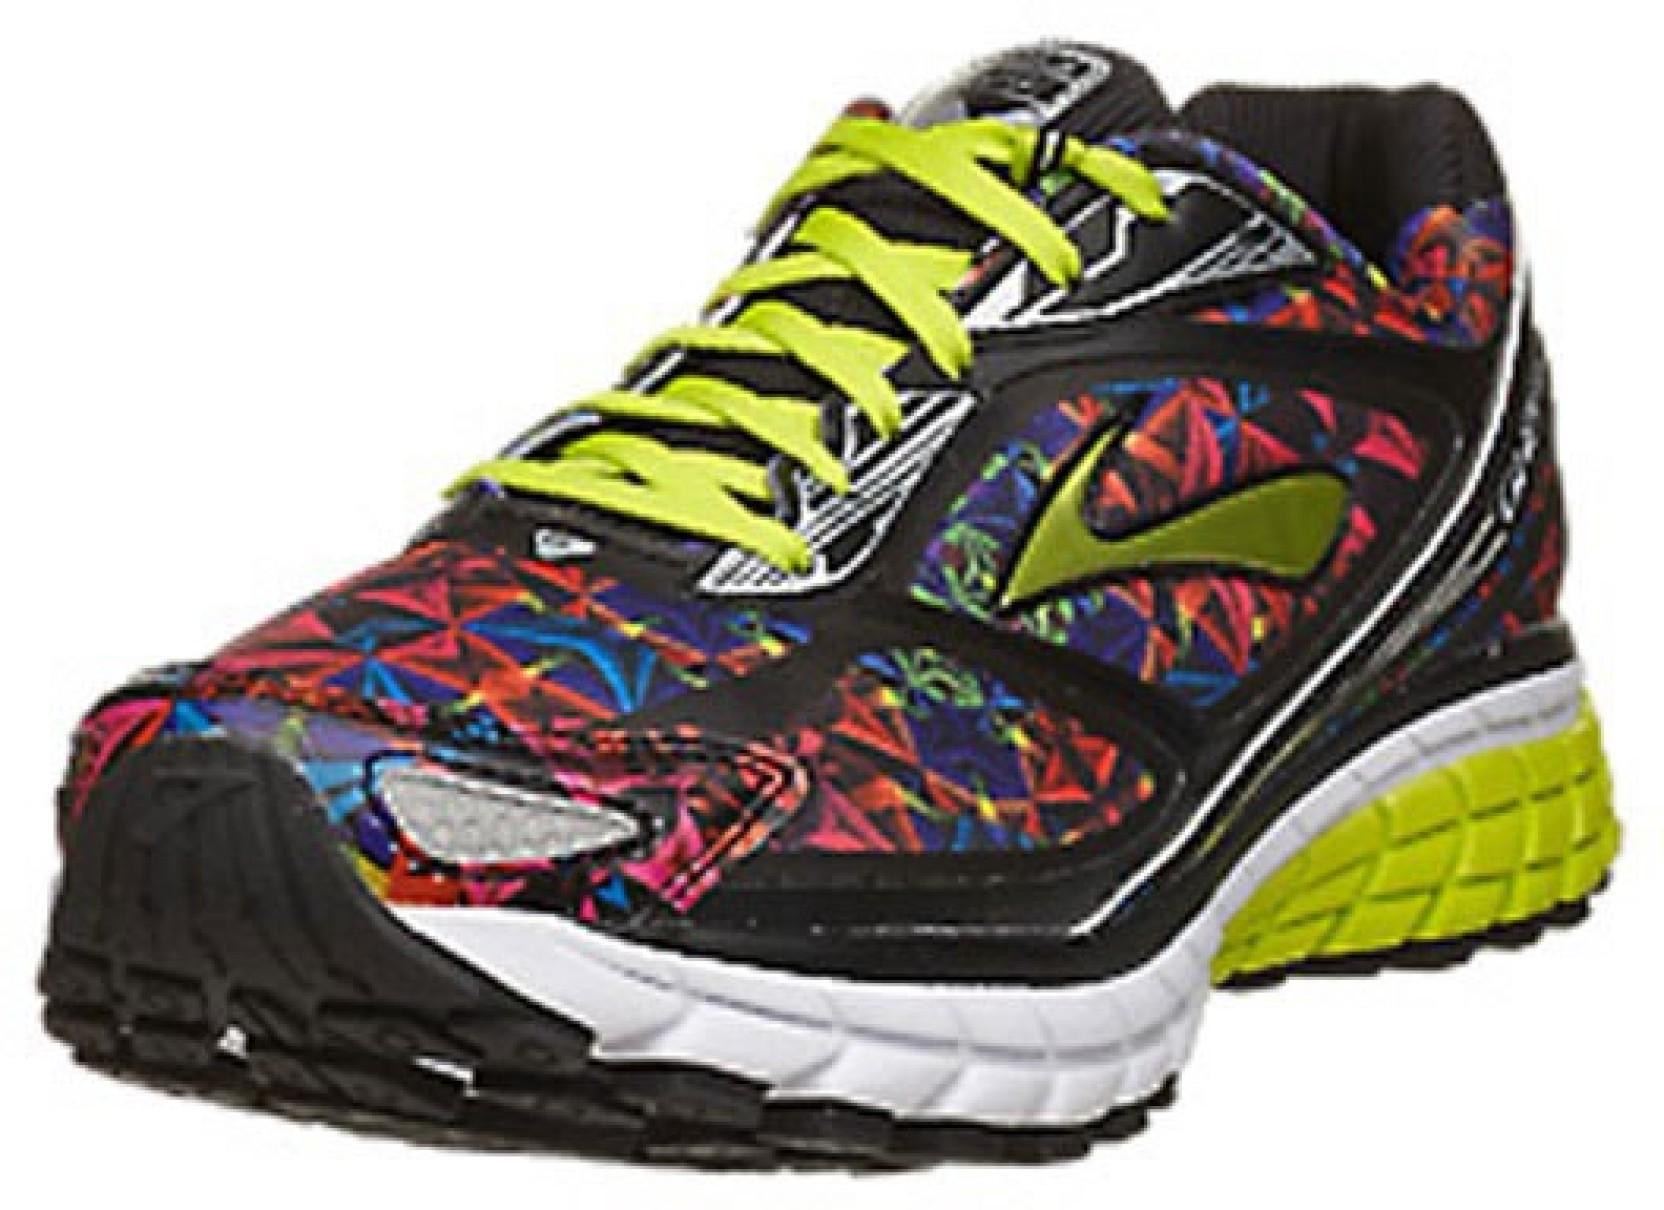 ef1c20578361d Brooks Ghost 7 Men s Running Shoes For Men - Buy Kaleidoscope Color ...